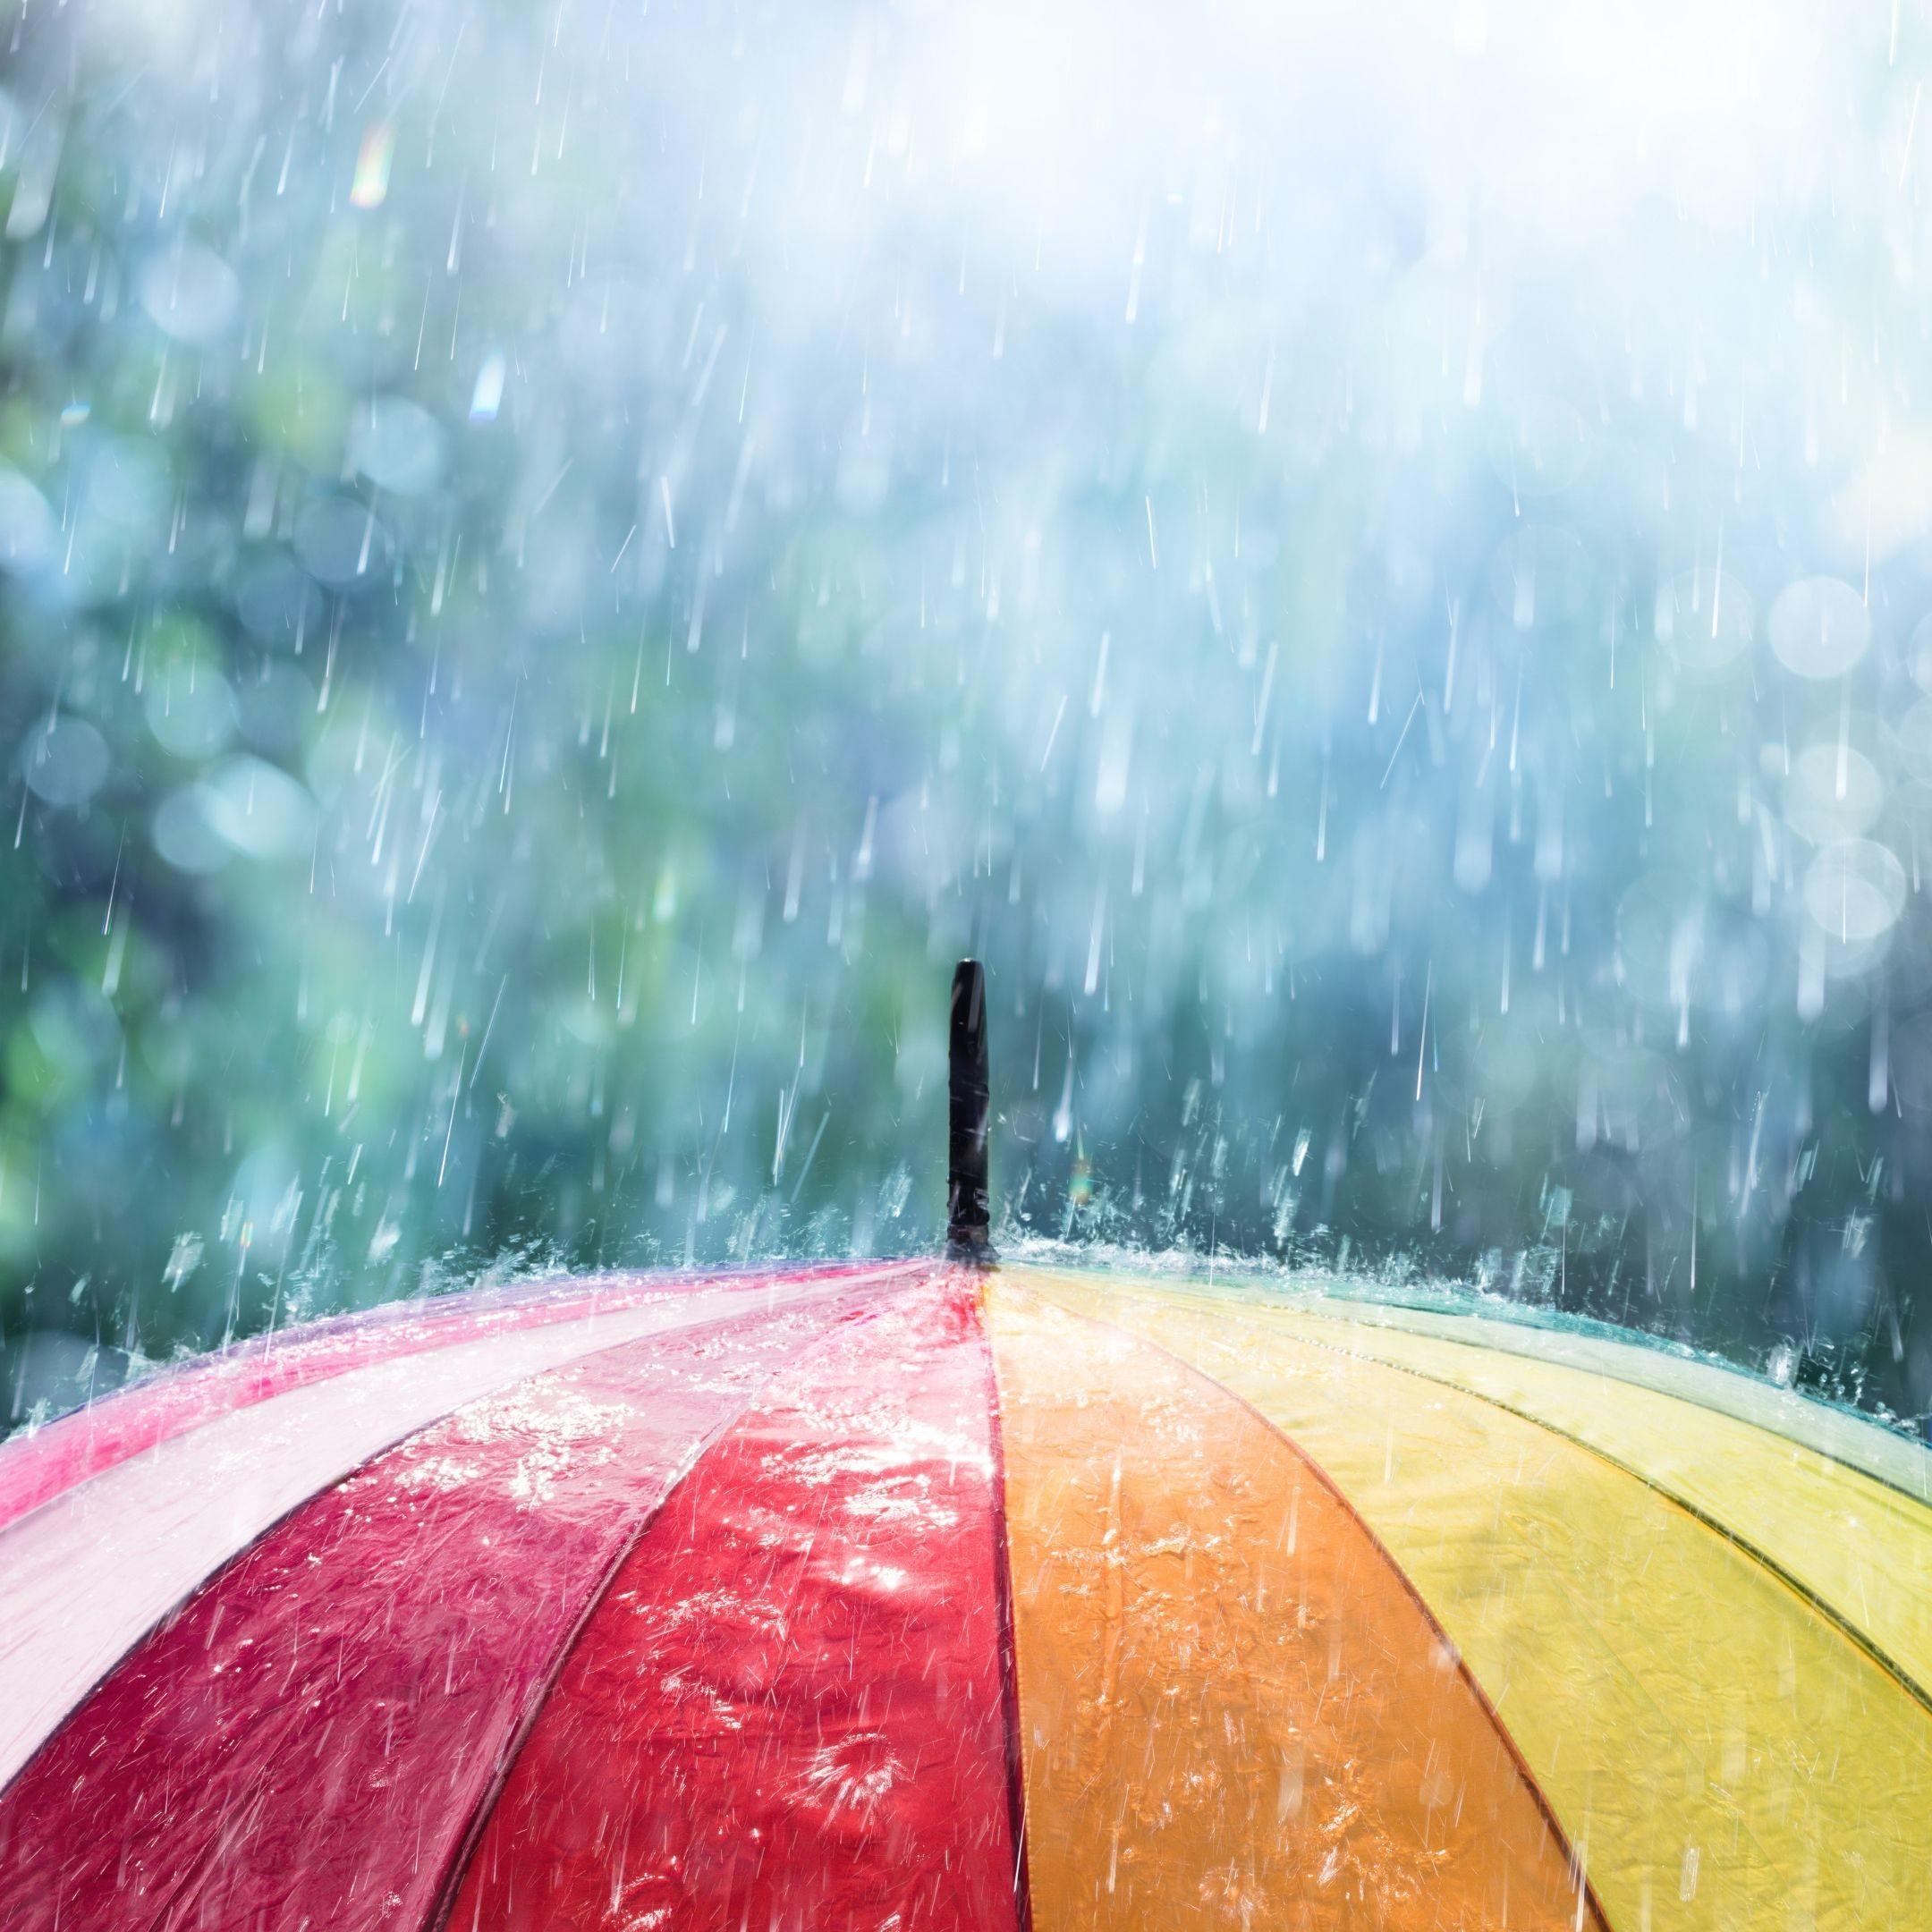 Colorful umbrella with rain falling on top